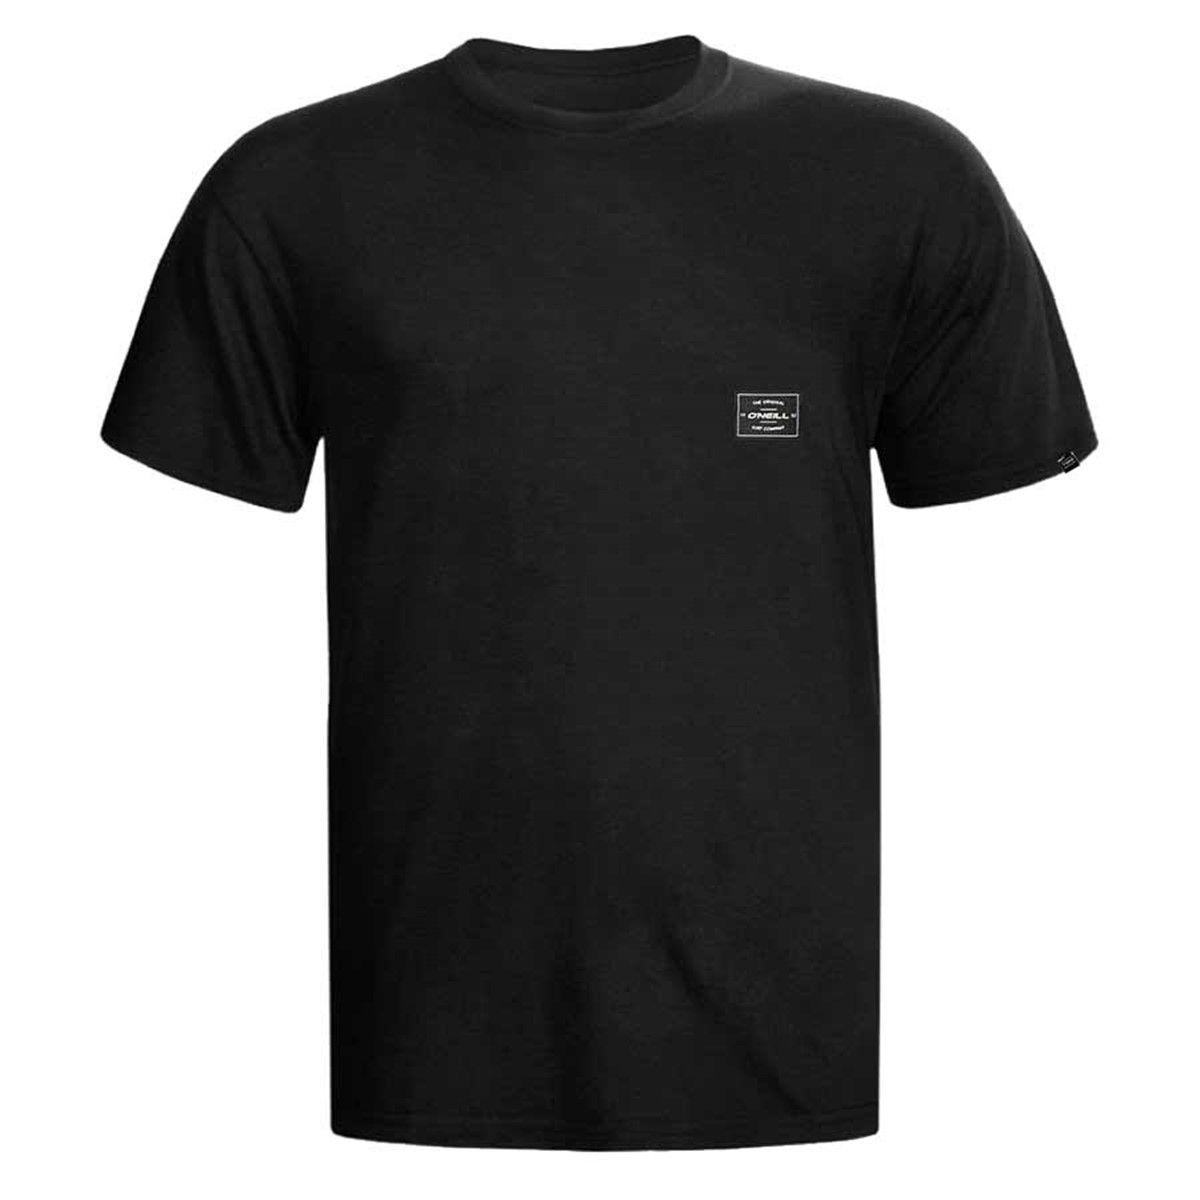 Camiseta O'Neill Return Black